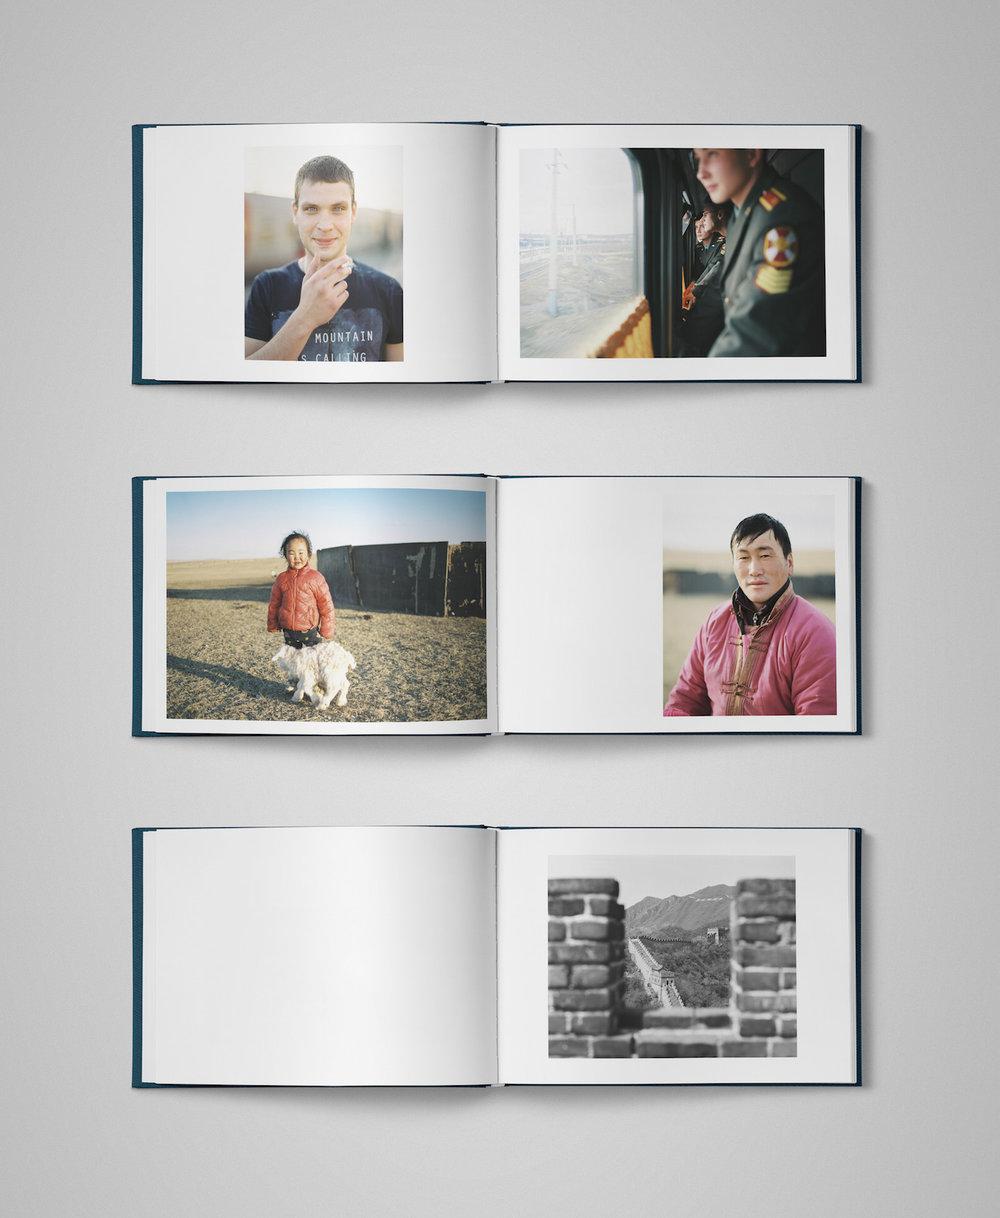 SOSNA_book-transsiberian-transsiberien-photos-photographe-echappee.jpg